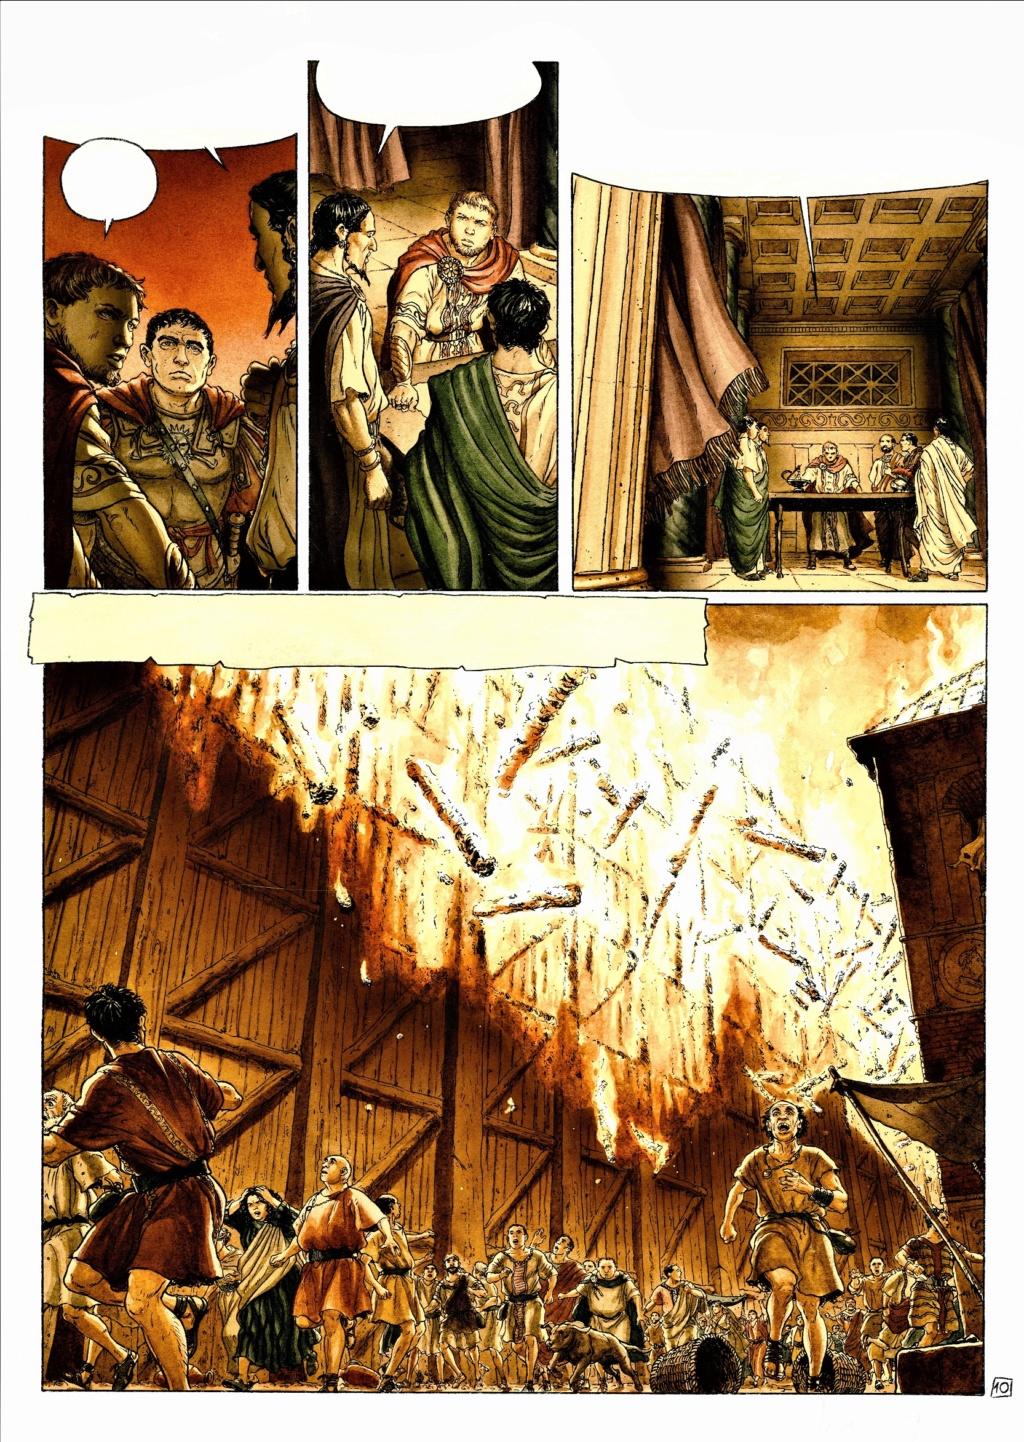 Murena a t-il remplacé Alix ? - Page 8 Delaby15